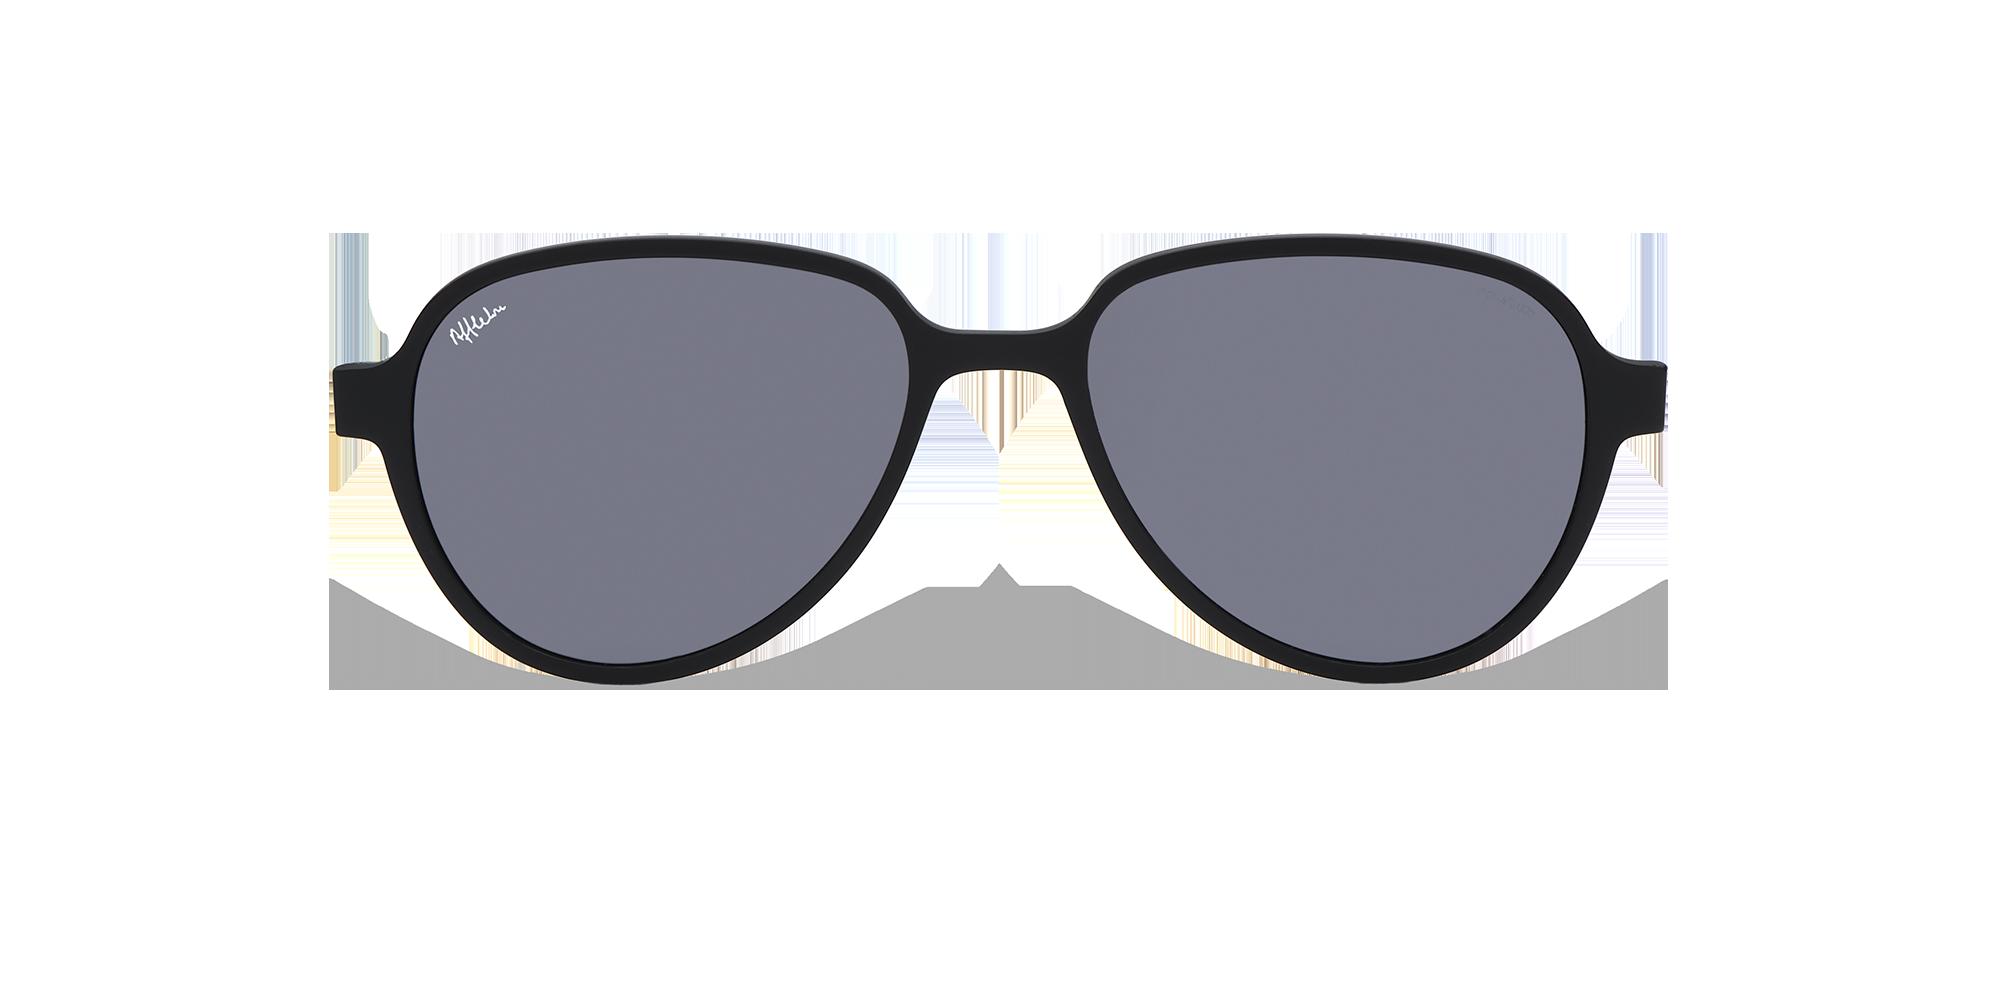 afflelou/france/products/smart_clip/clips_glasses/TMK43POBK015417.png